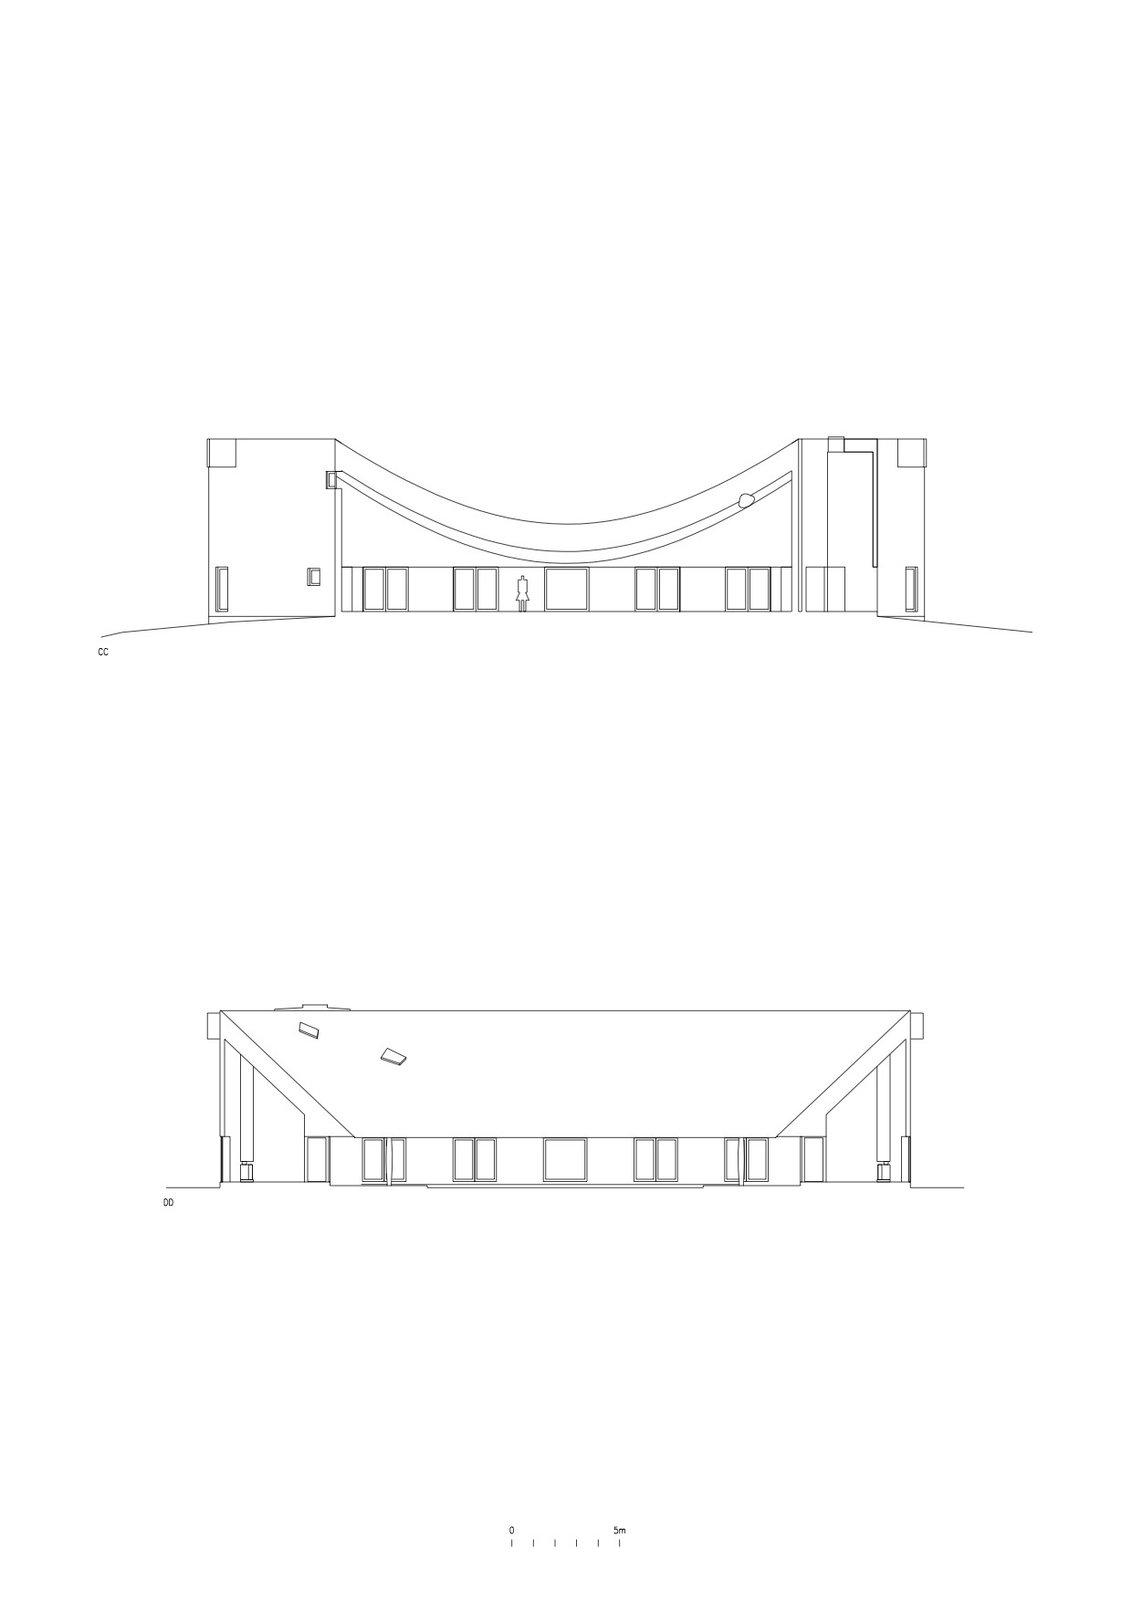 Cross section of Rode House by Pezo von Ellrichshausen Arquitectos.